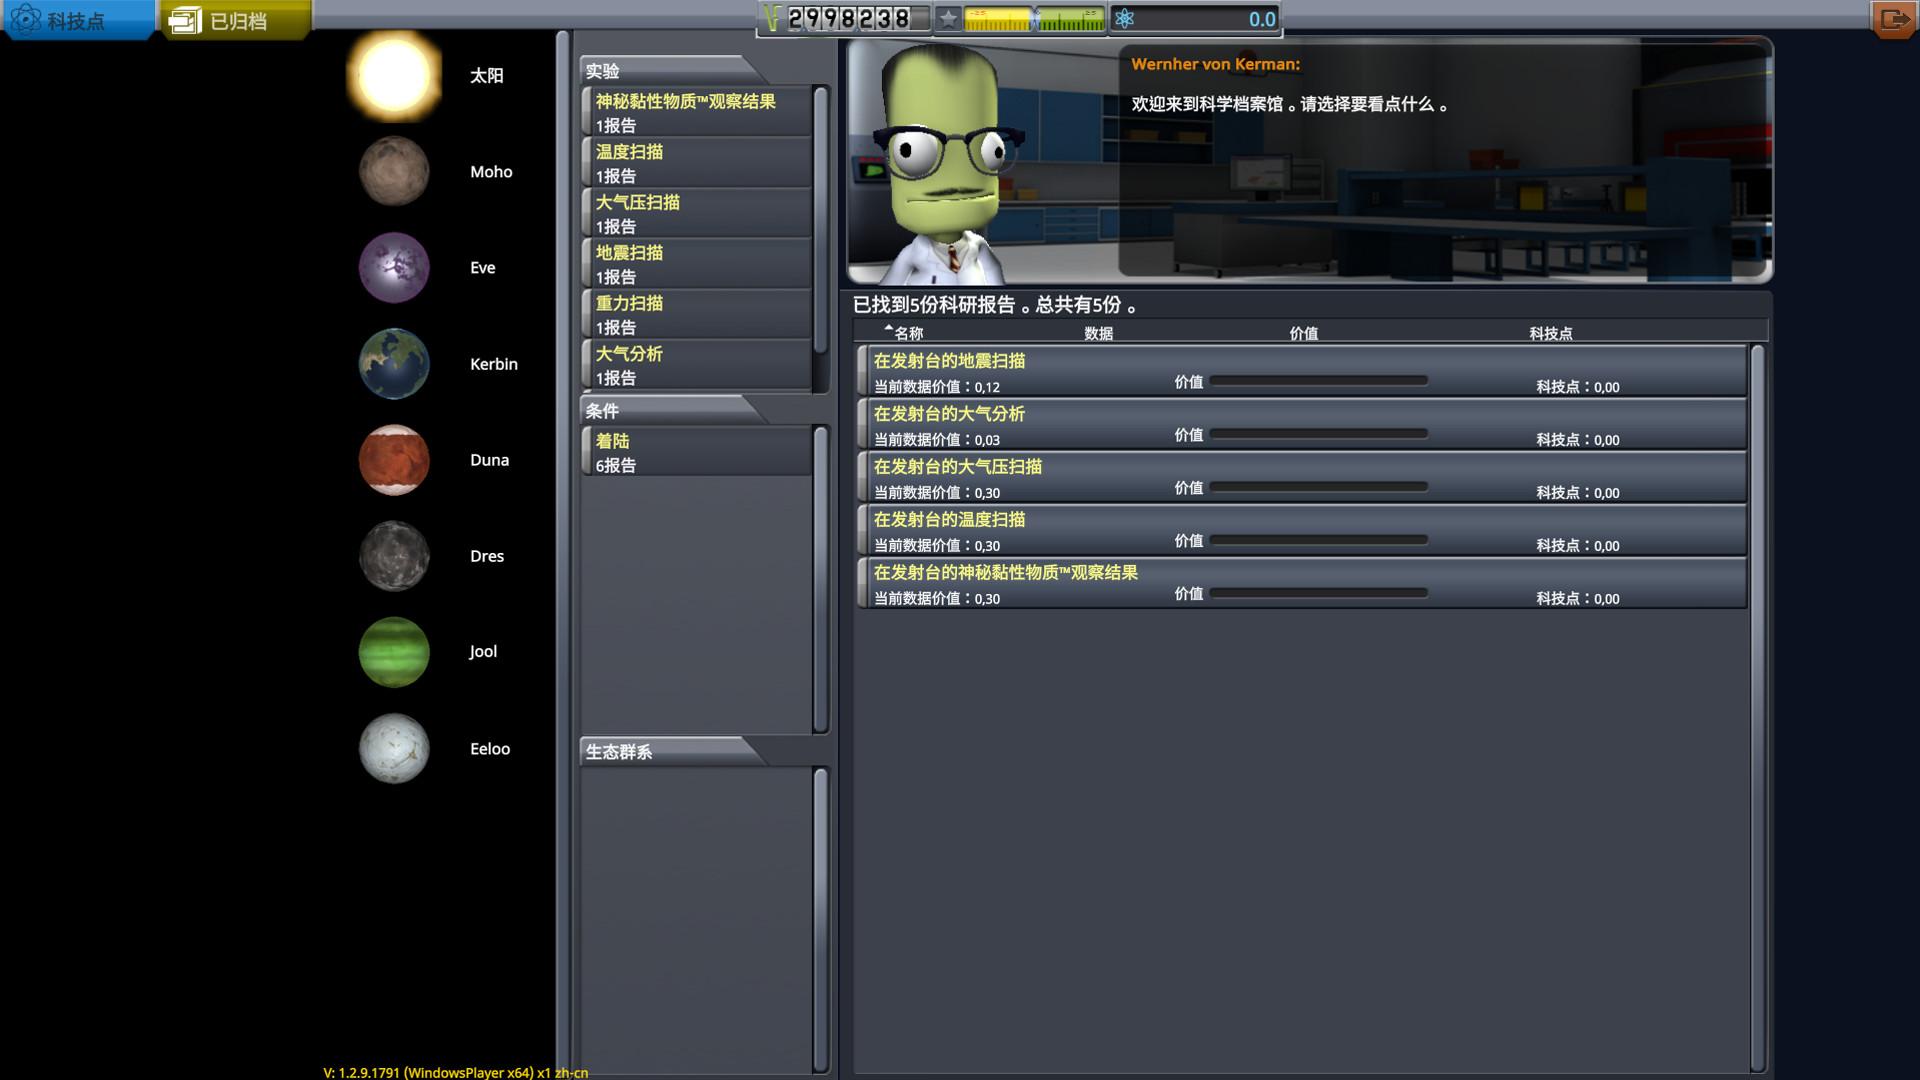 sbf胜博发备用网址_坎巴拉太空计划 v1.0.2升级档+破解补丁[CODEX]